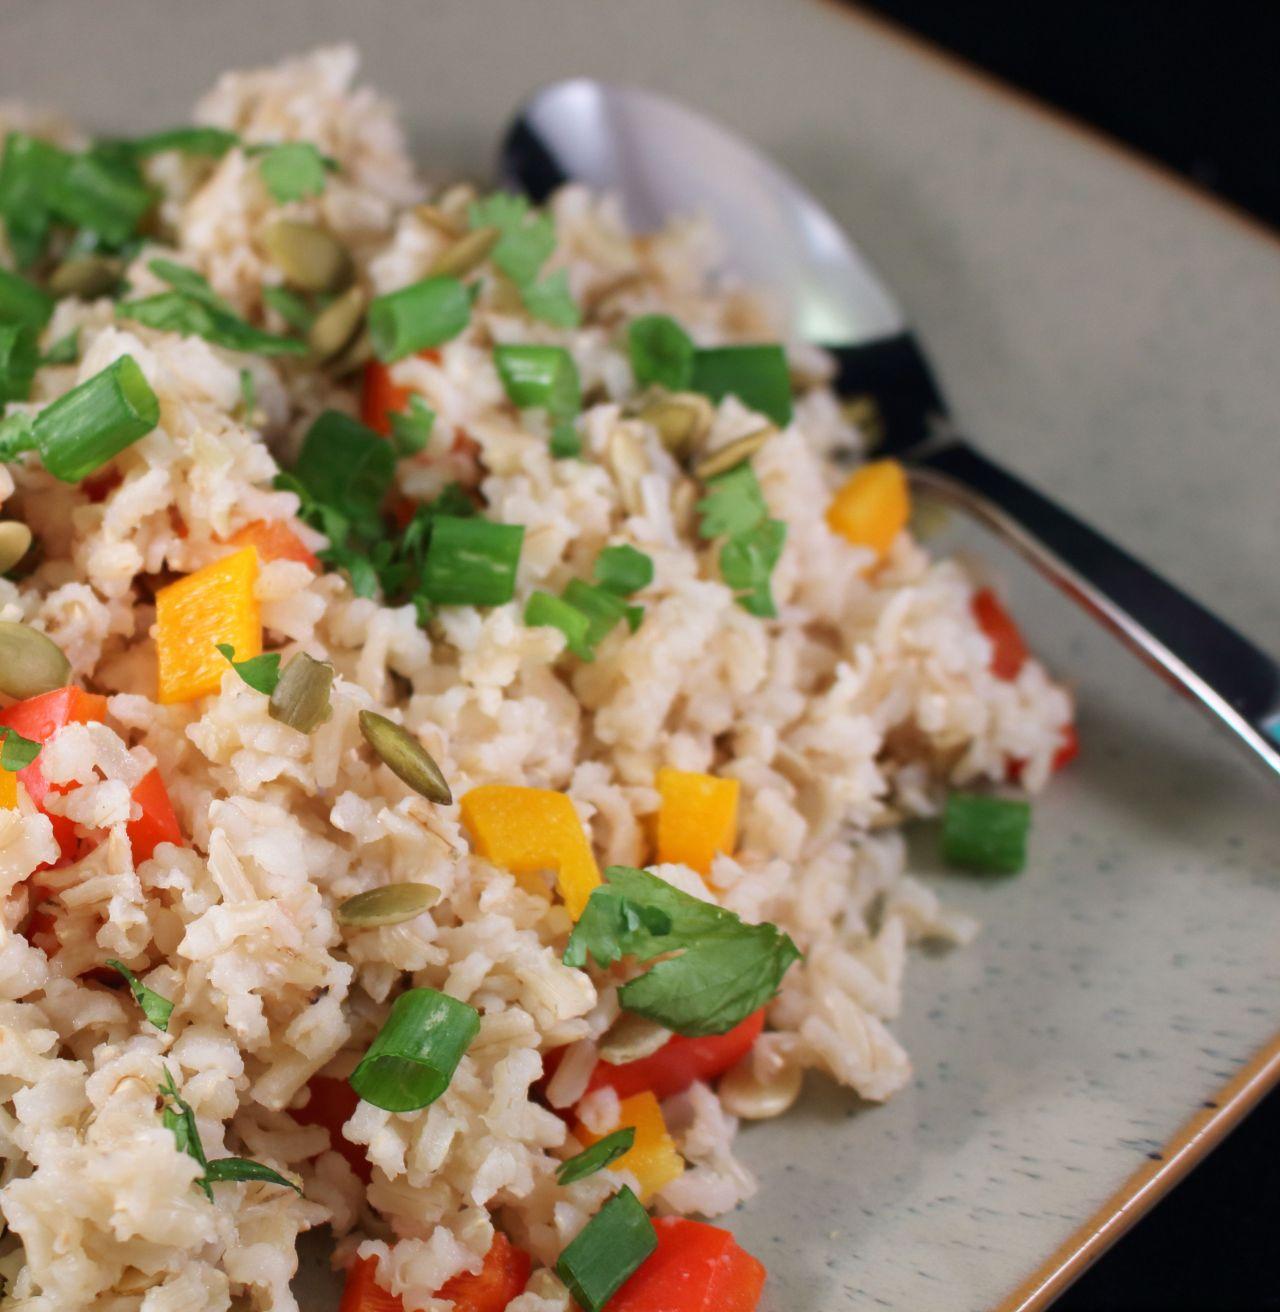 Basmati Vegetable Rice with Pumpkin Seeds Closeup